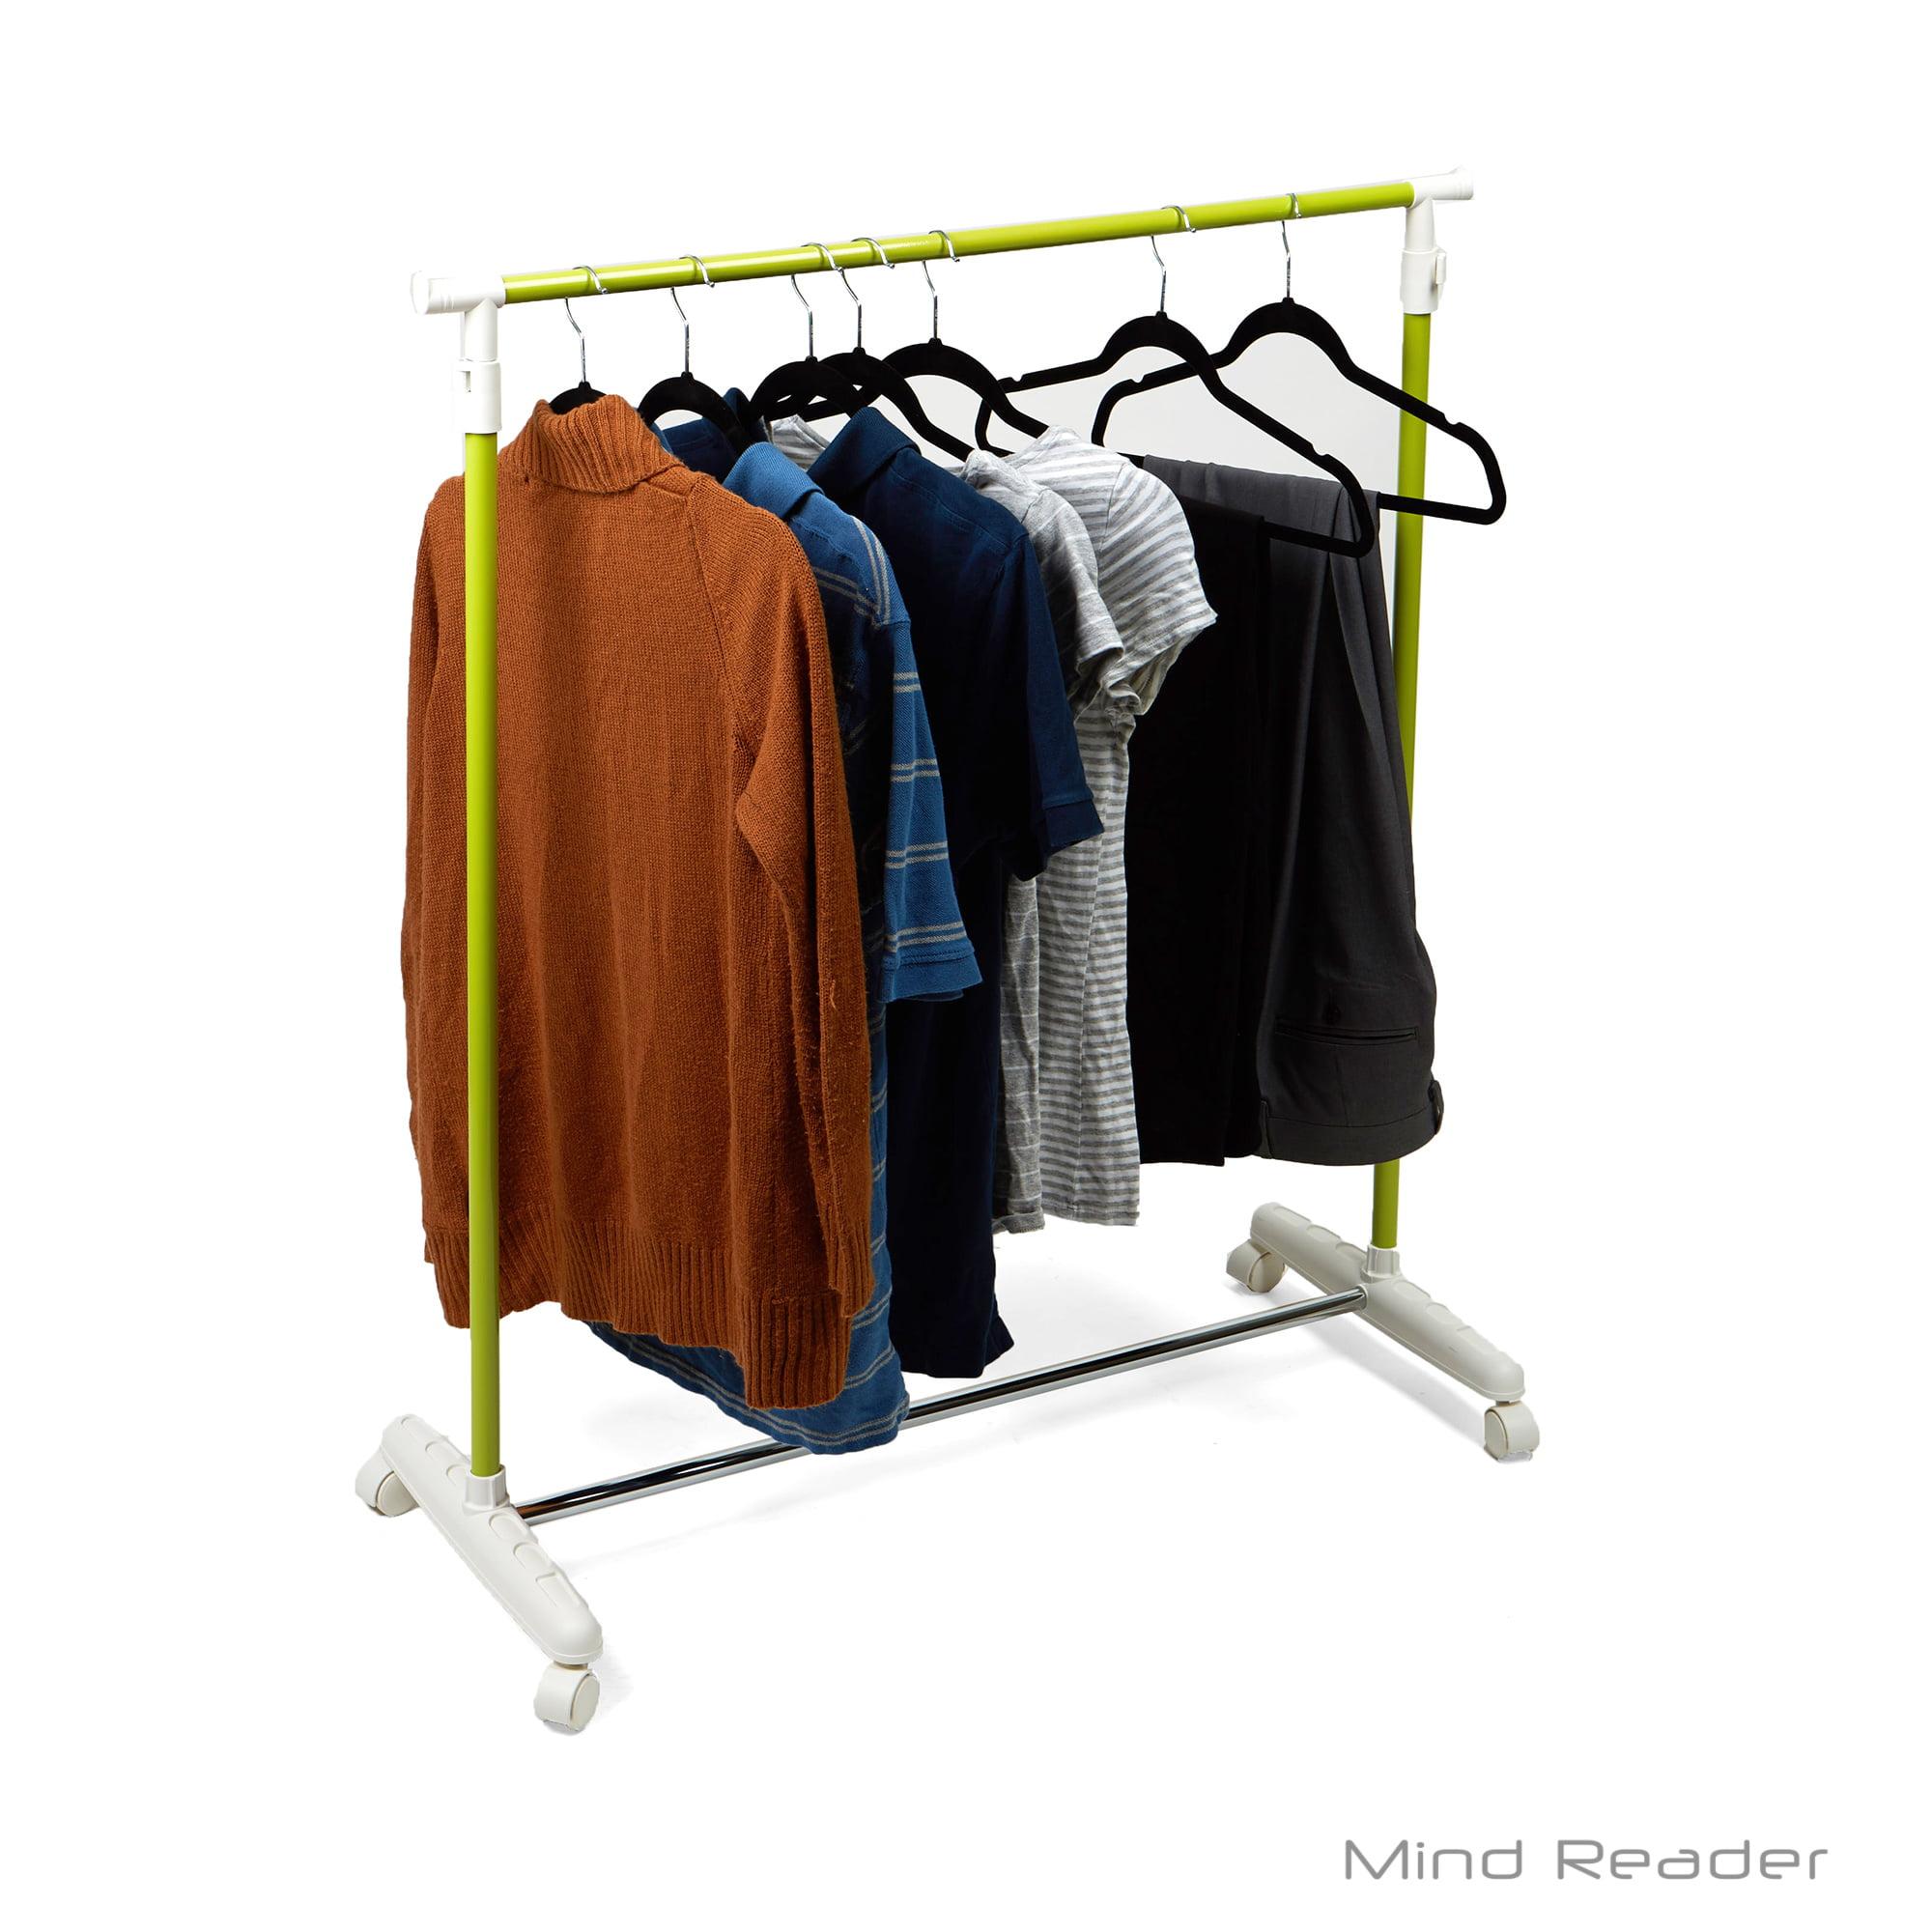 Mind Reader Metal Single Rolling Garment Rack, Green